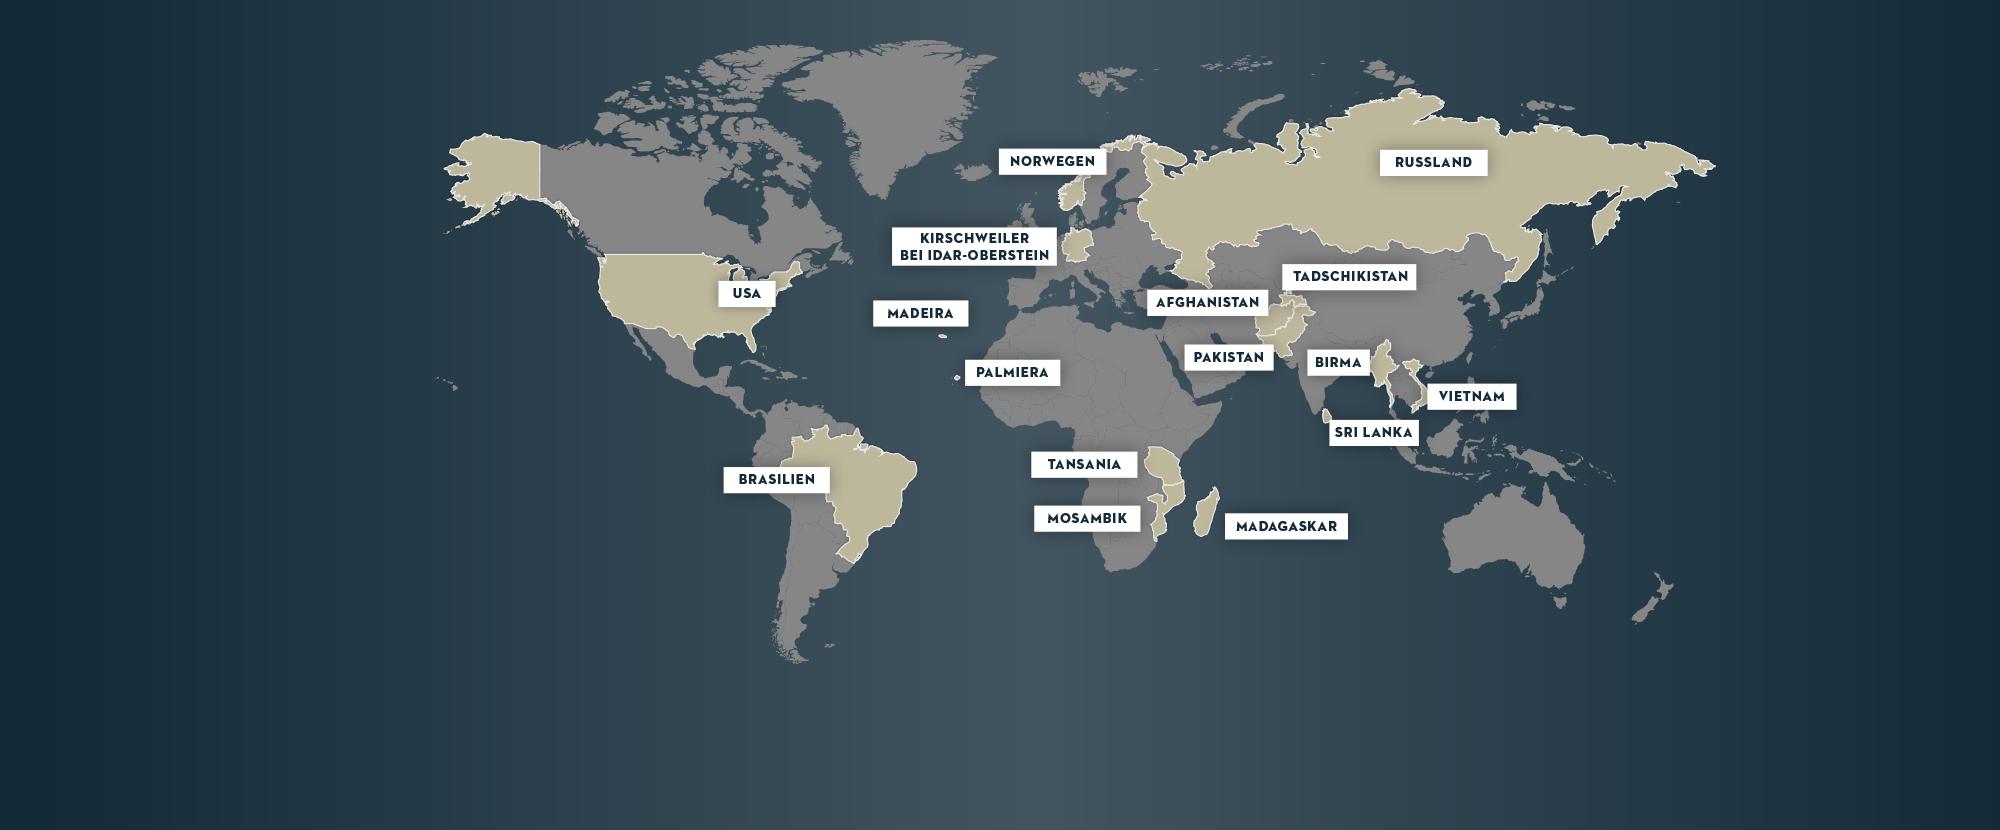 Weltkarte mit bereisten Orten: USA, Brasilien, Madeira, Palmiera, Kirschweiler bei Idar-Oberstein, Norwegen, Tansania, Mosambik, Madagaskar, Afghanistan, Pakistan, Tadschikistan, Birma, Sri Lanka, Vietnam, Russland